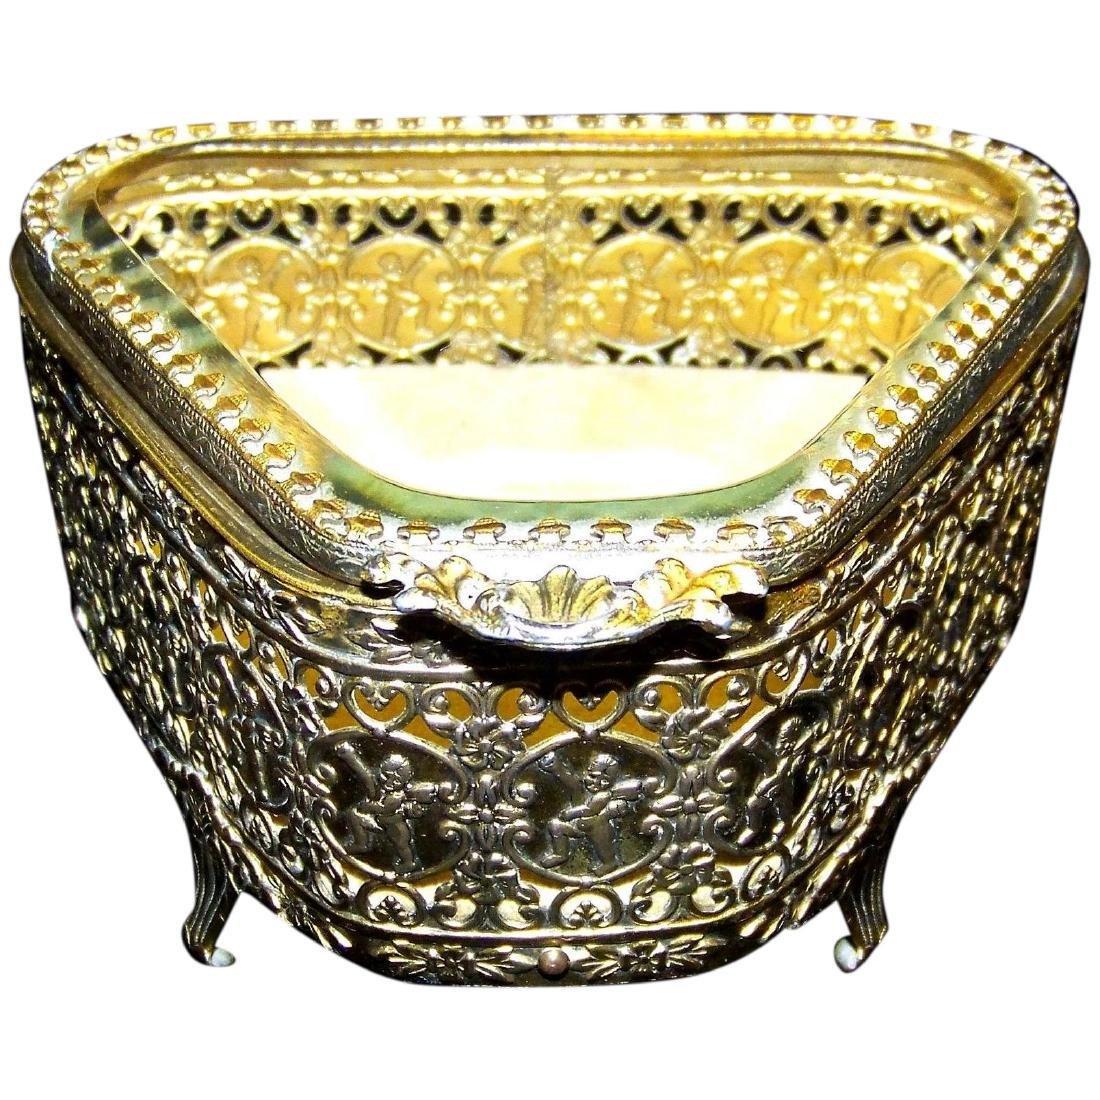 Vintage Stylebuilt Gold Filigree Ormolu Jewelry Casket